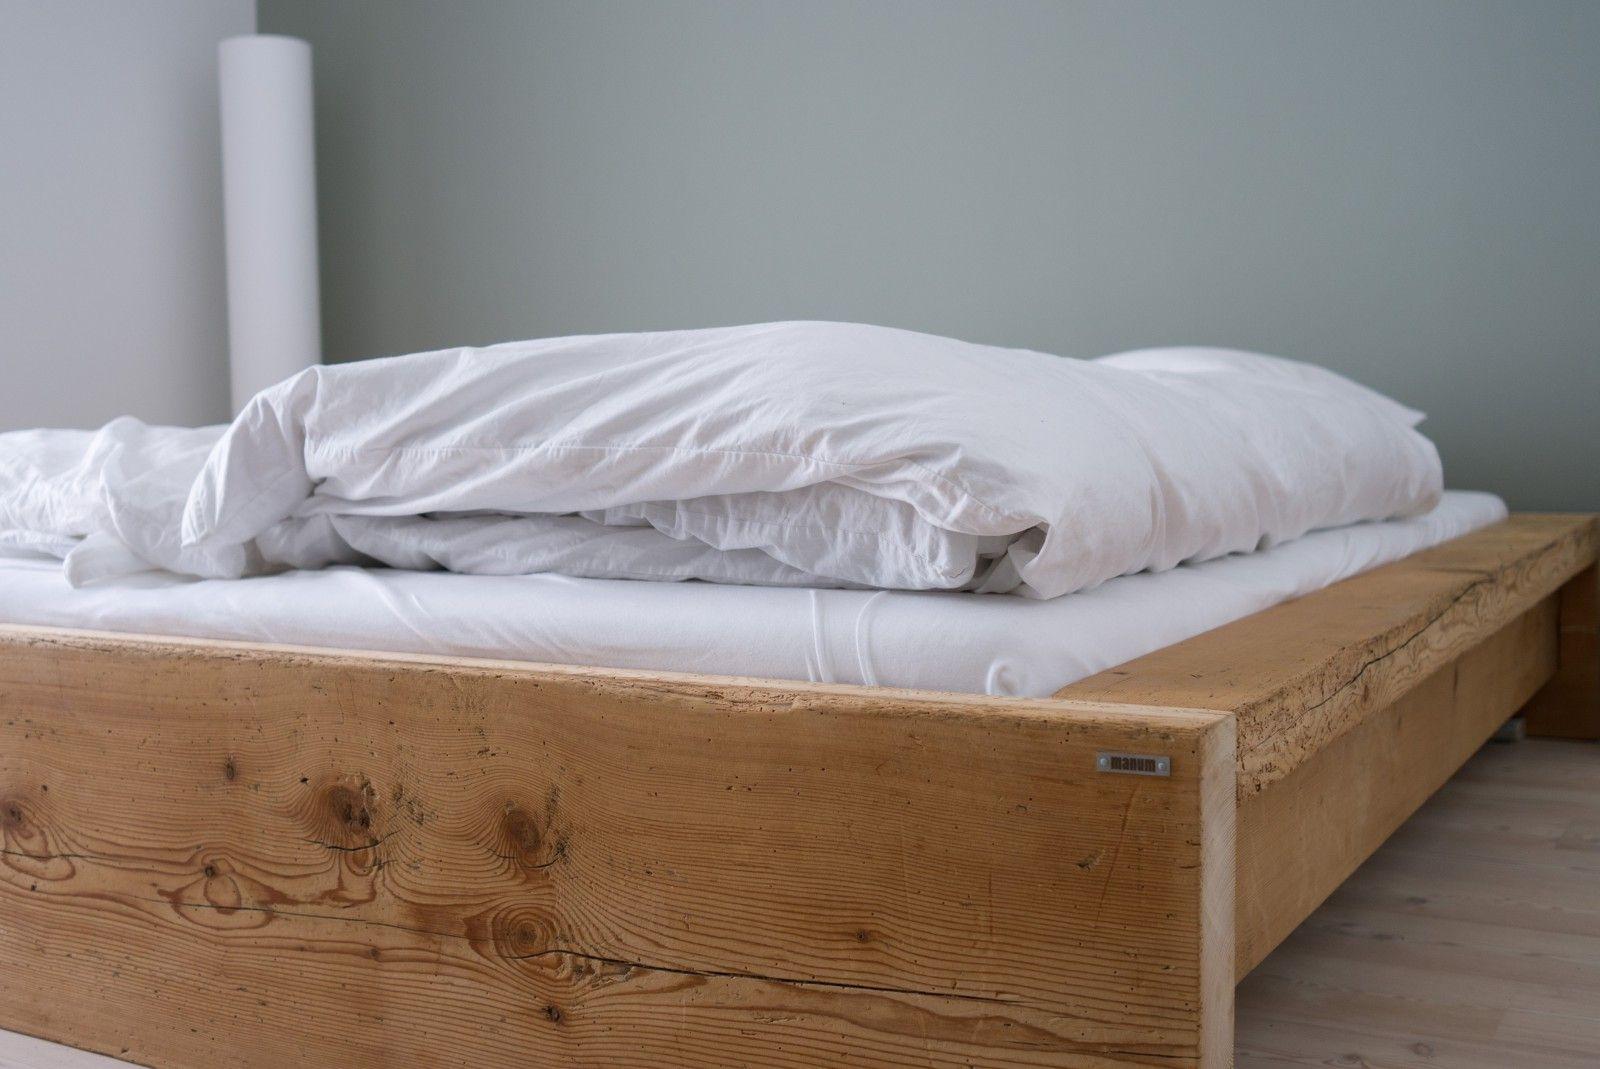 bett aus altholz schlafzimmer bedrooms pinterest altholz bett und m bel aus altholz. Black Bedroom Furniture Sets. Home Design Ideas